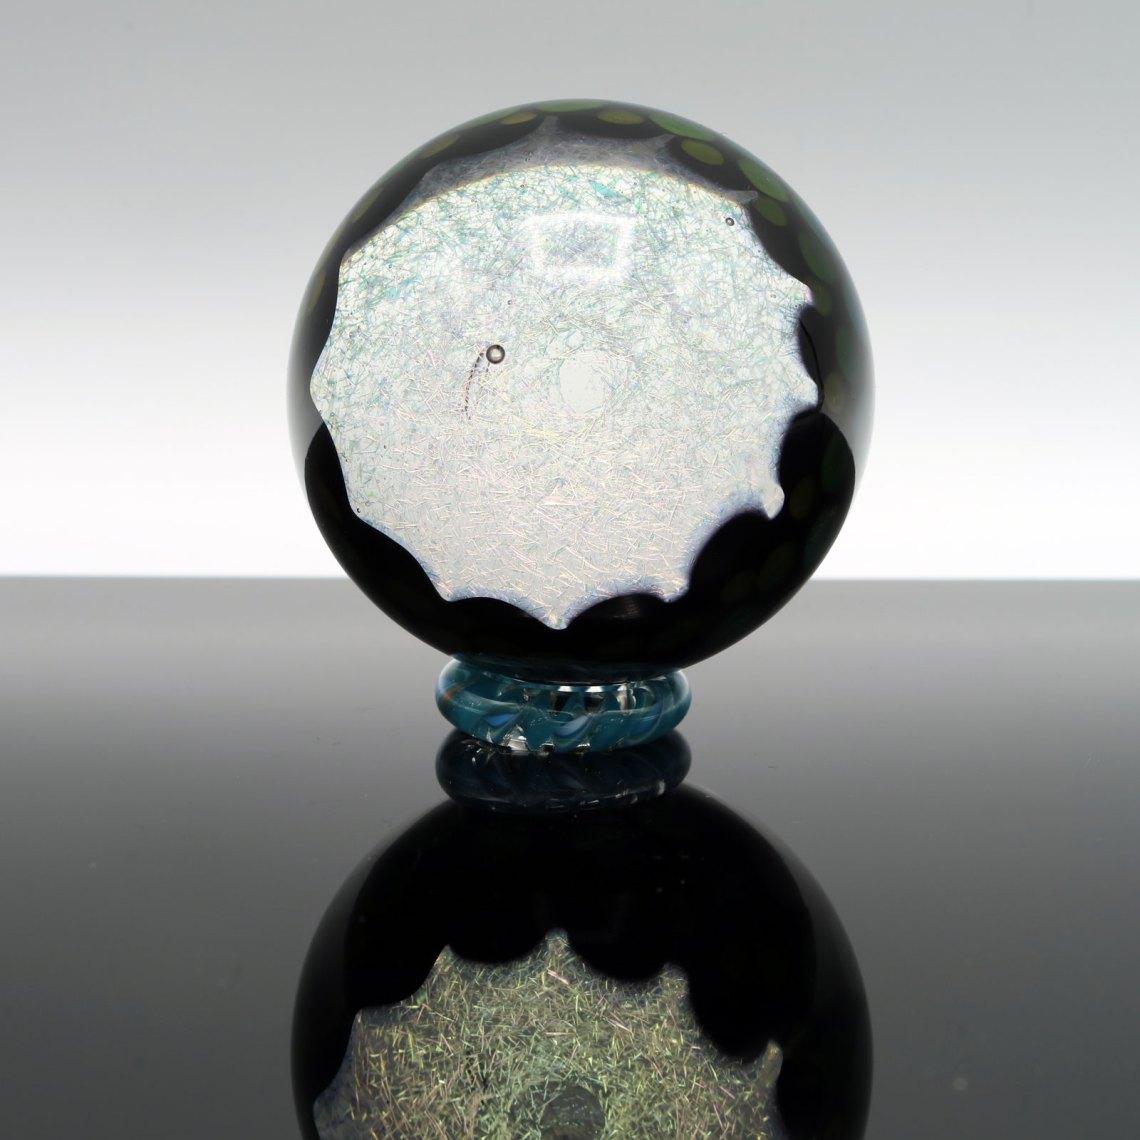 Kiebler X Garden of Eden Glass – Dichro XXXL Marble Collab